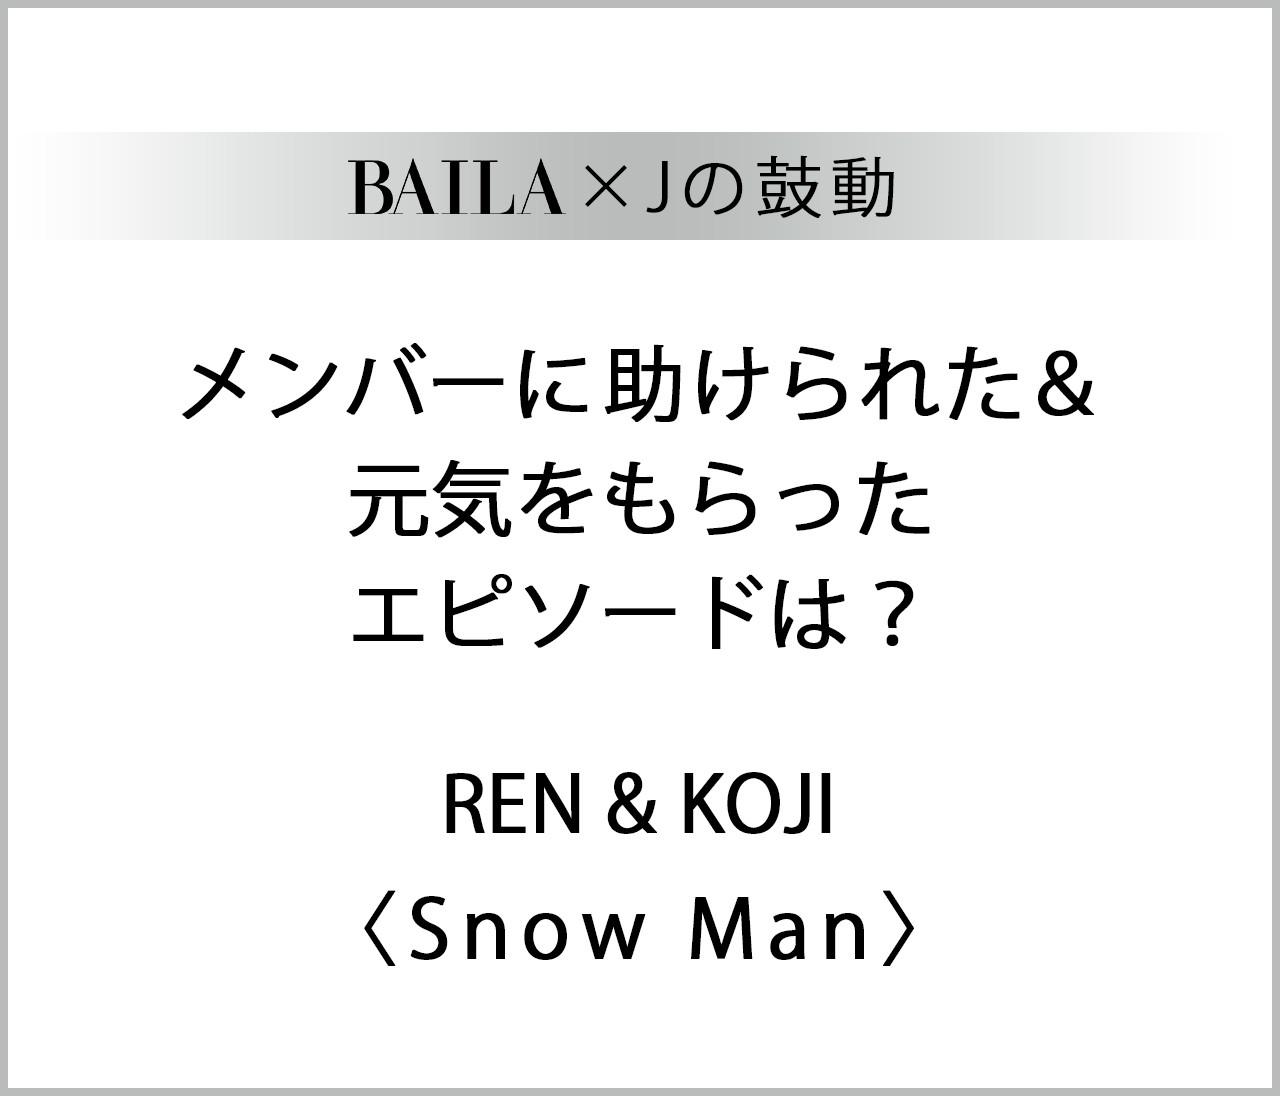 【 #SnowMan #目黒蓮 #向井康二 】メンバーに助けられた&元気をもらったエピソードは?【BAILA × Jの鼓動】